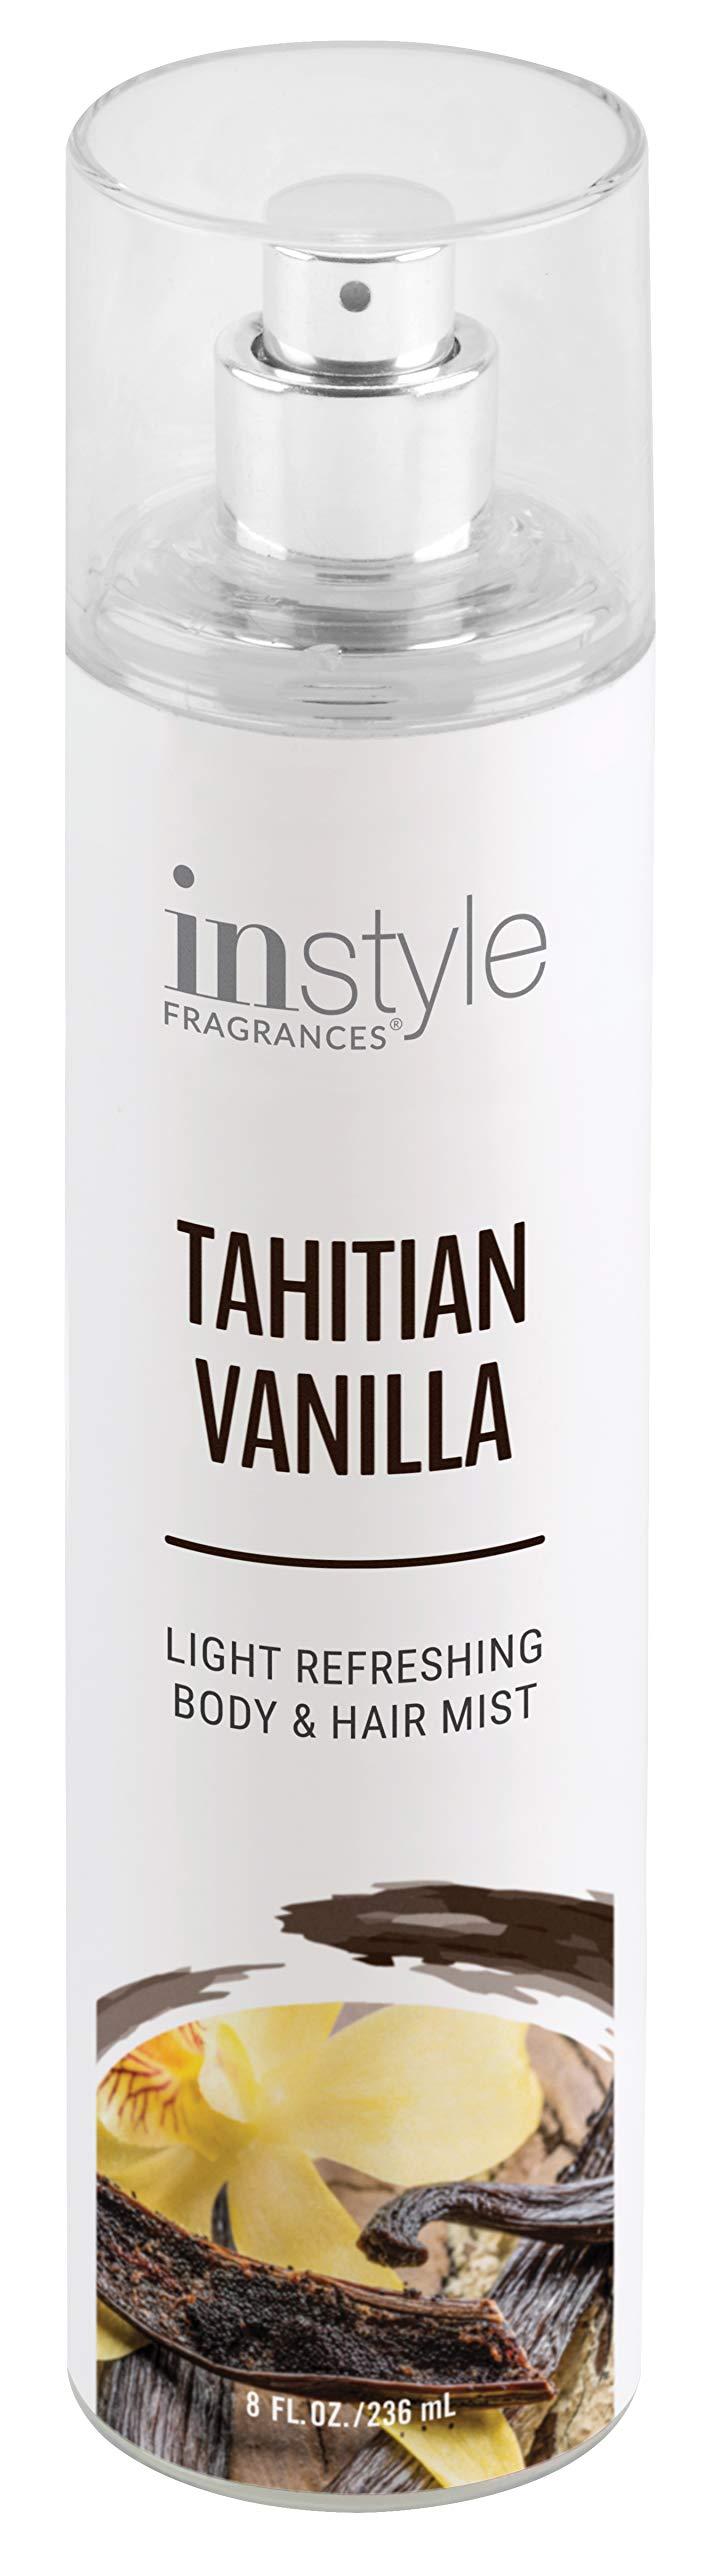 Instyle Fragrances | Body & Hair Mist | Tahitian Vanilla Scent | With Panthenol | CLEAN, Vegan, Paraben Free, Phthalate Free | Premium 8 Fl Oz Spray Bottle